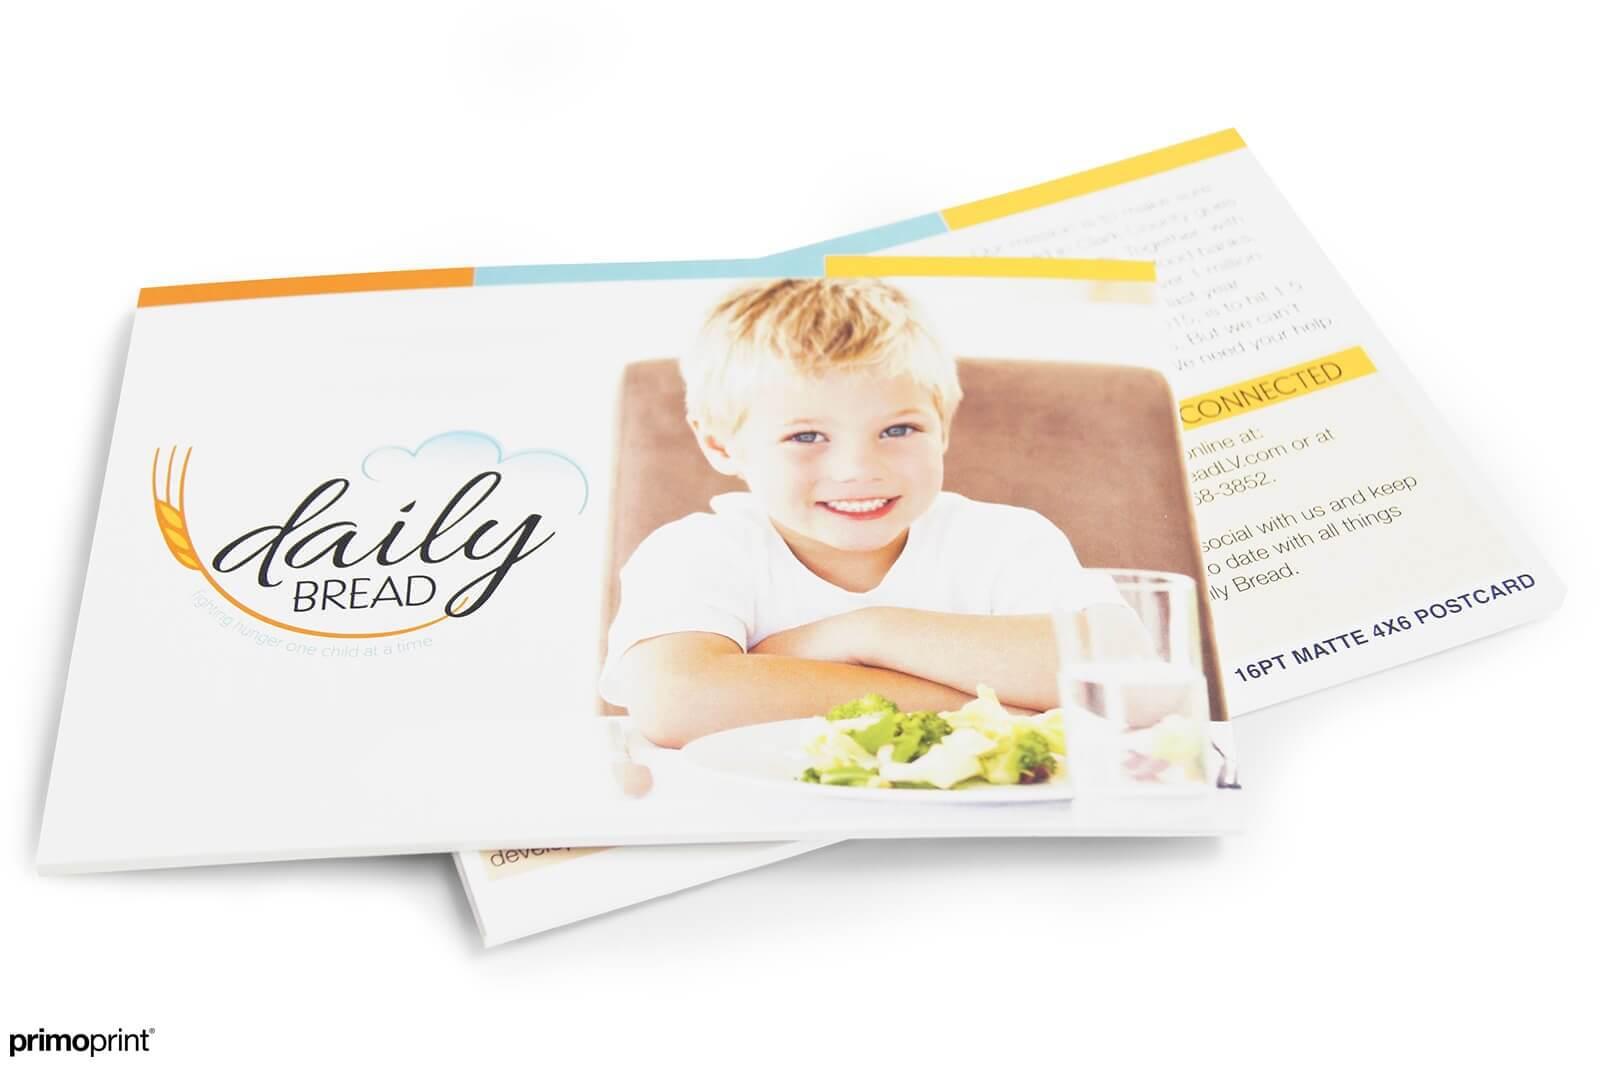 16PT Matte 4x6 postcard. Postcard designed by Primoprint.